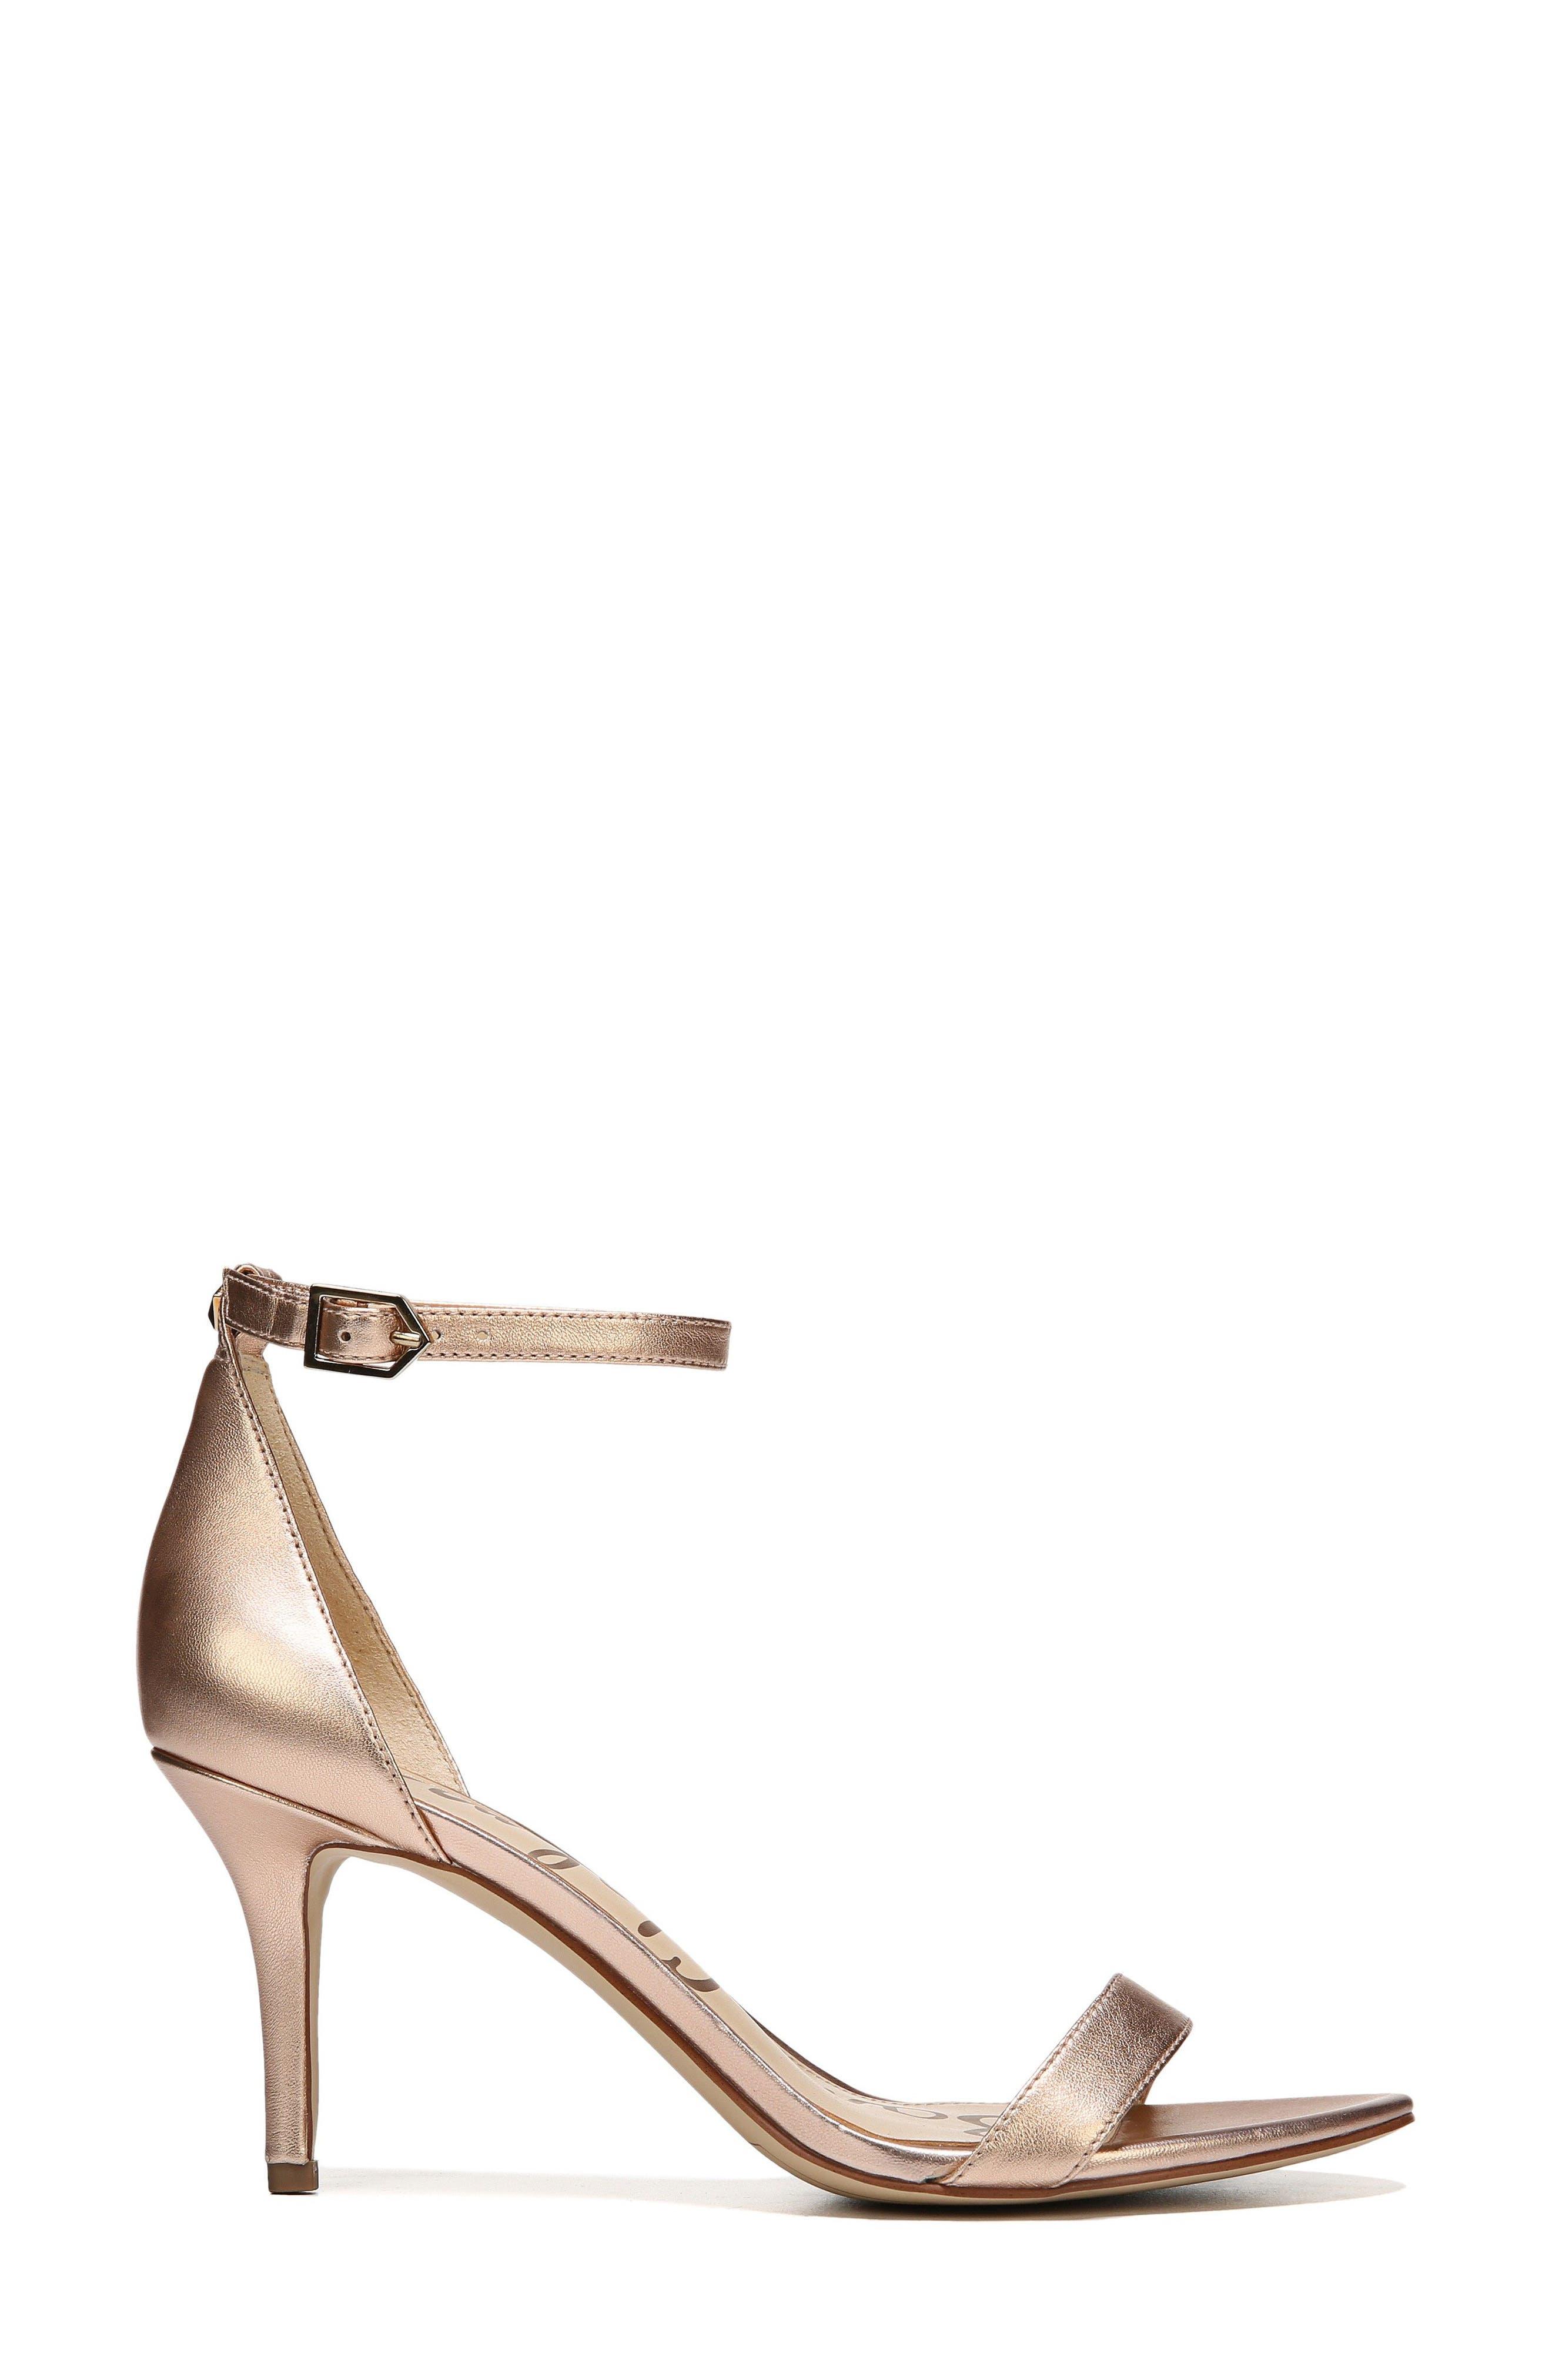 ,                             'Patti' Ankle Strap Sandal,                             Alternate thumbnail 170, color,                             220